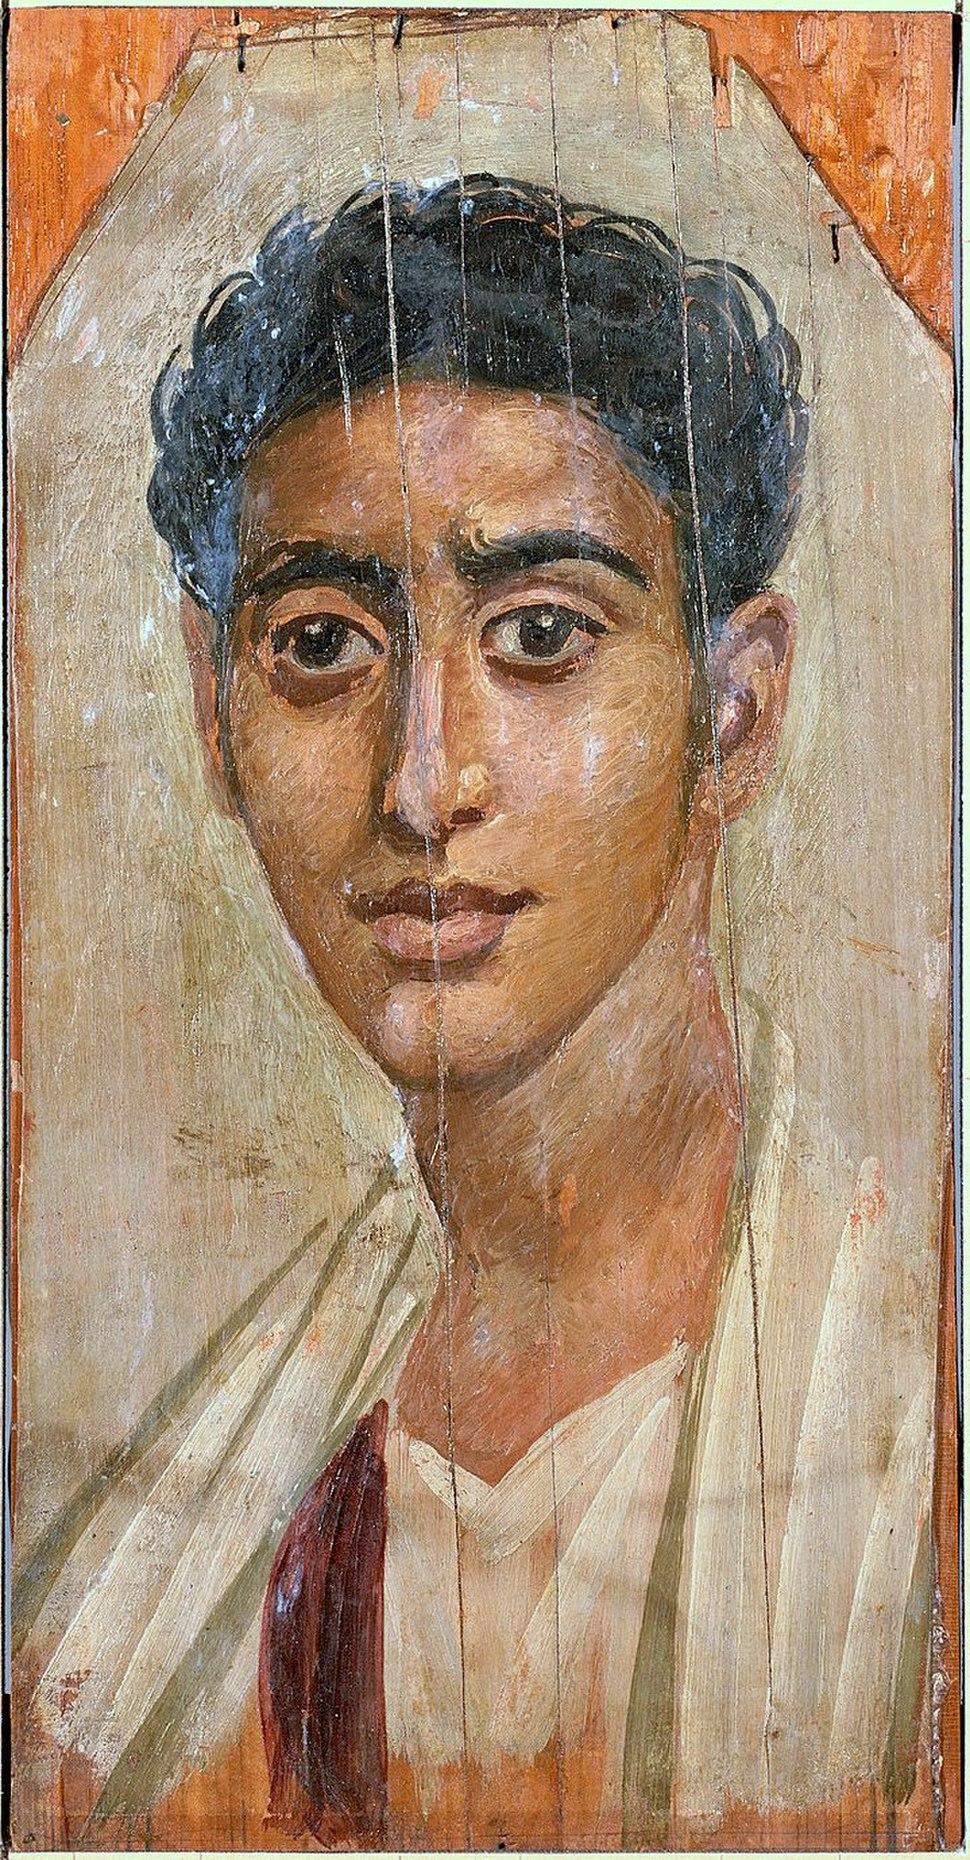 Egyptian - Mummy Portrait of a Man - Walters 323